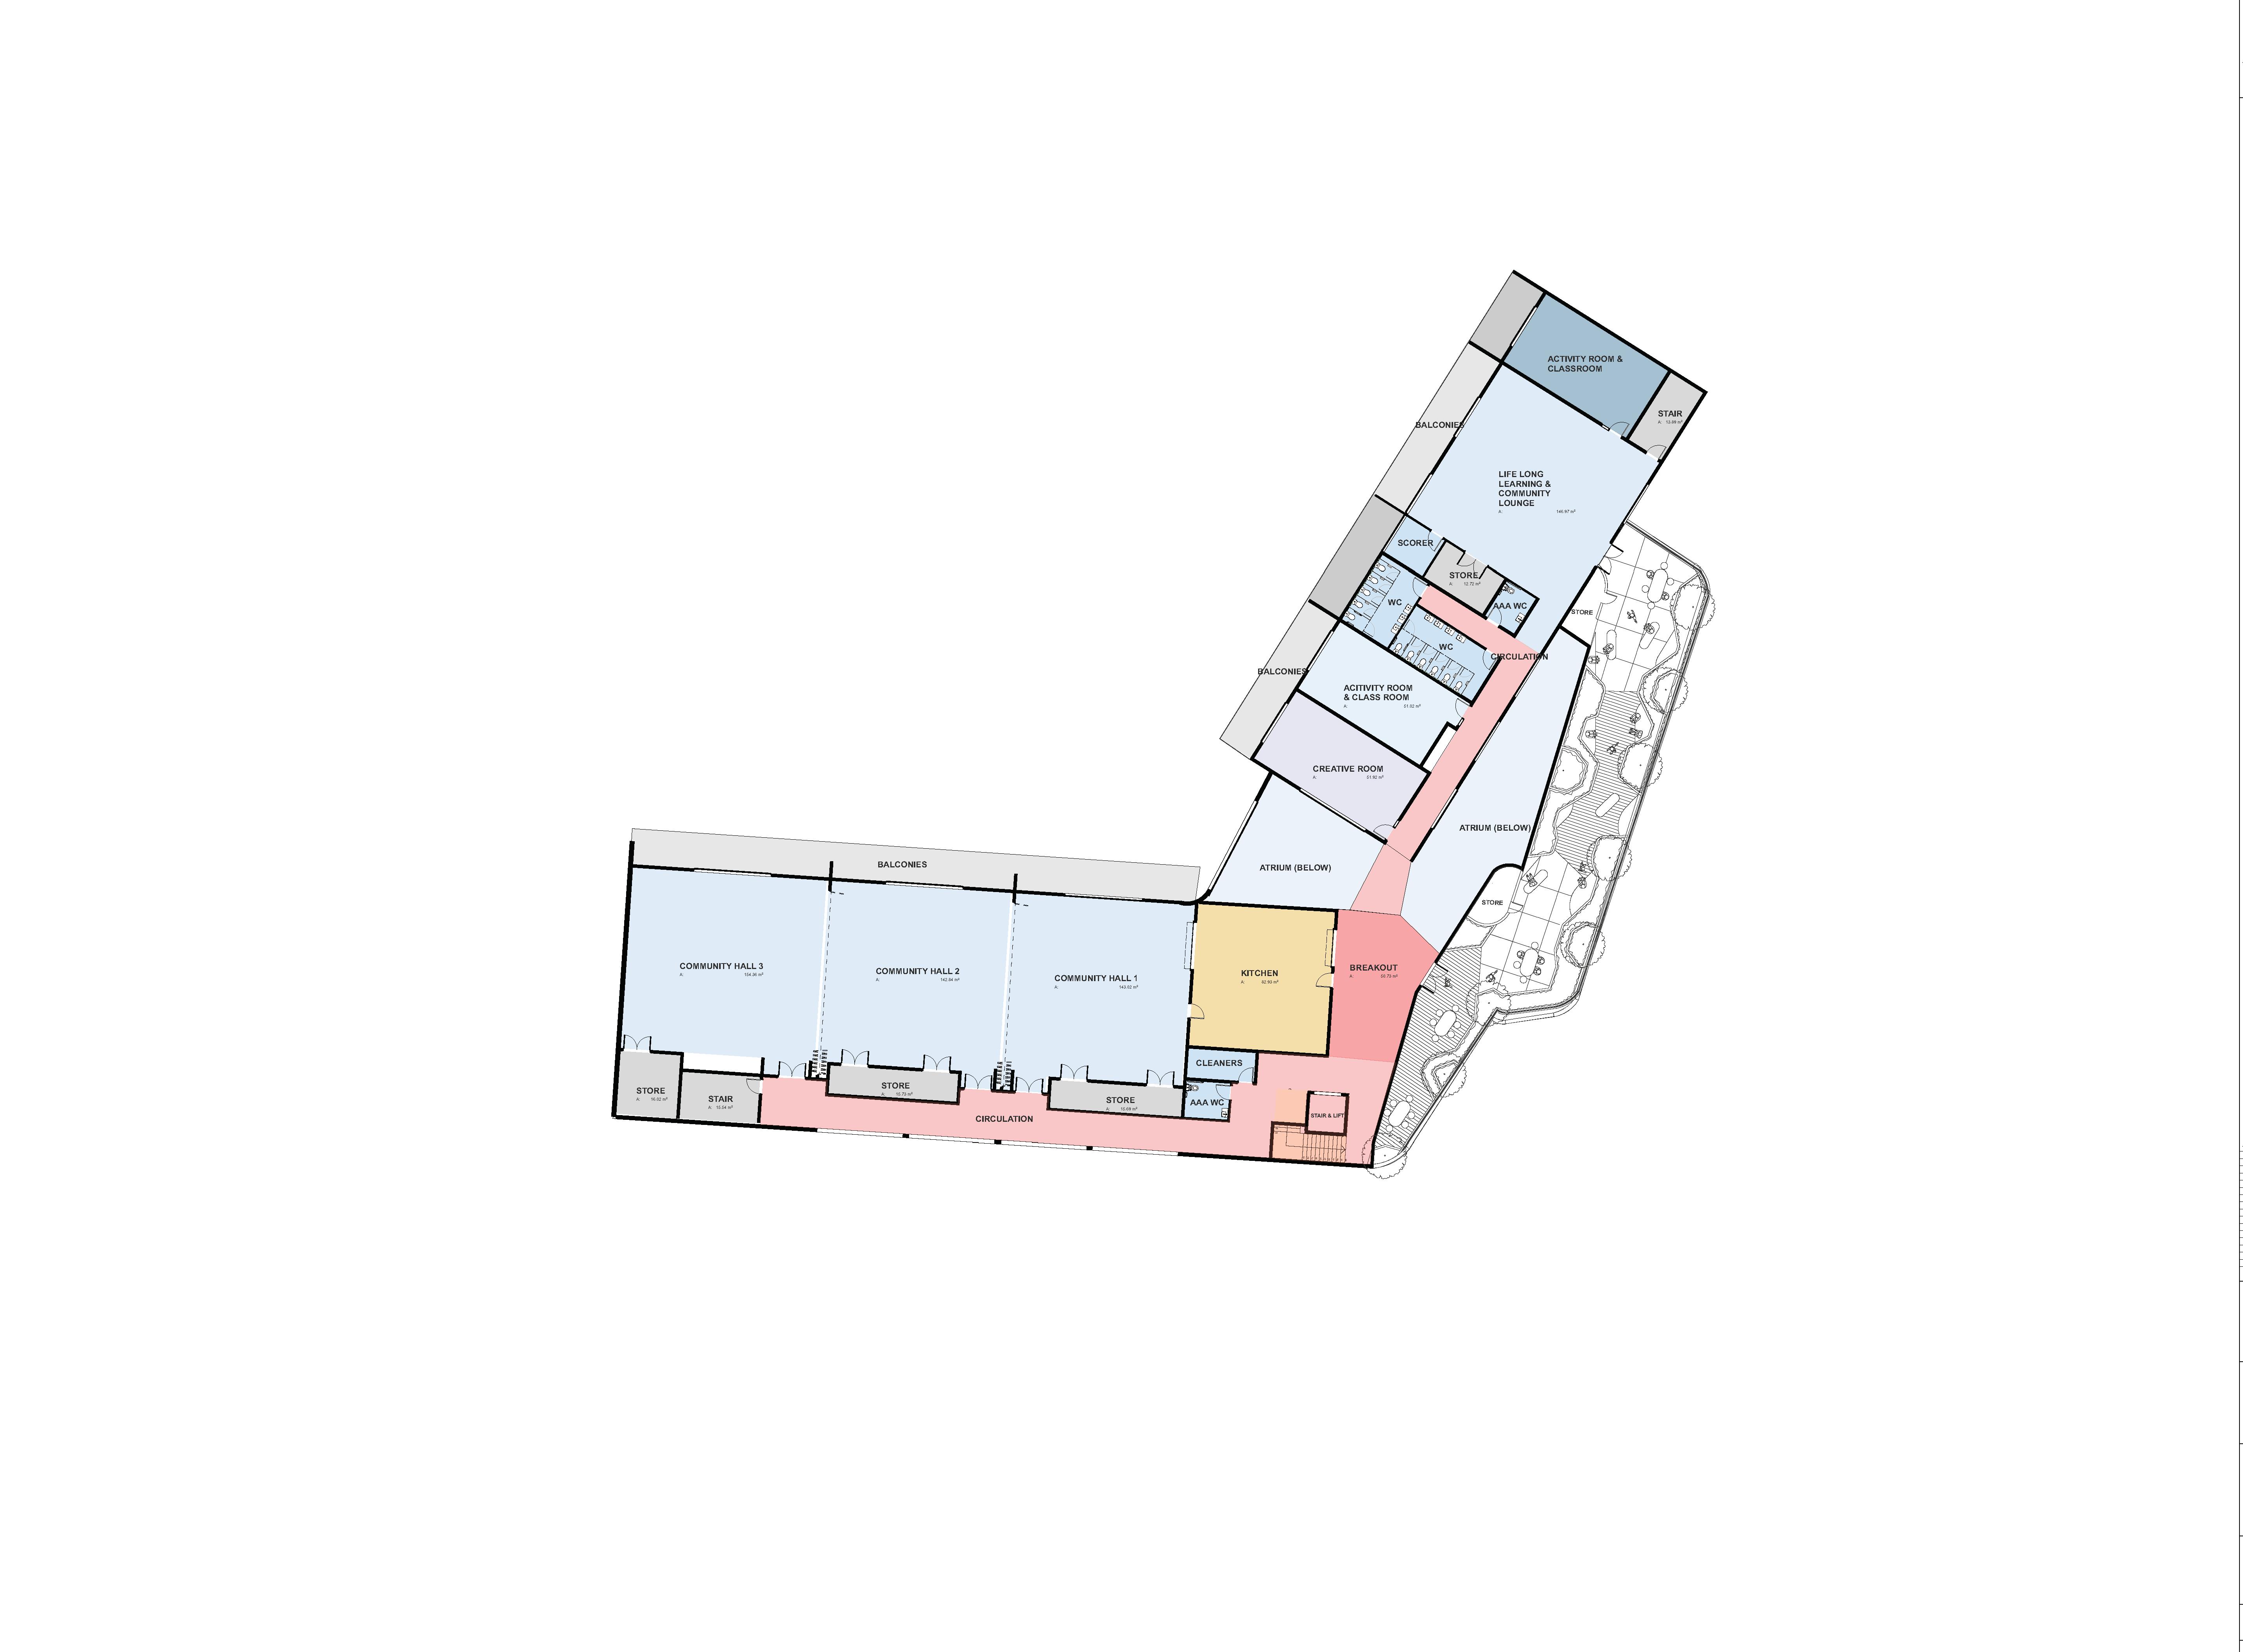 1949 A202 REVA First Floor Plan Colour